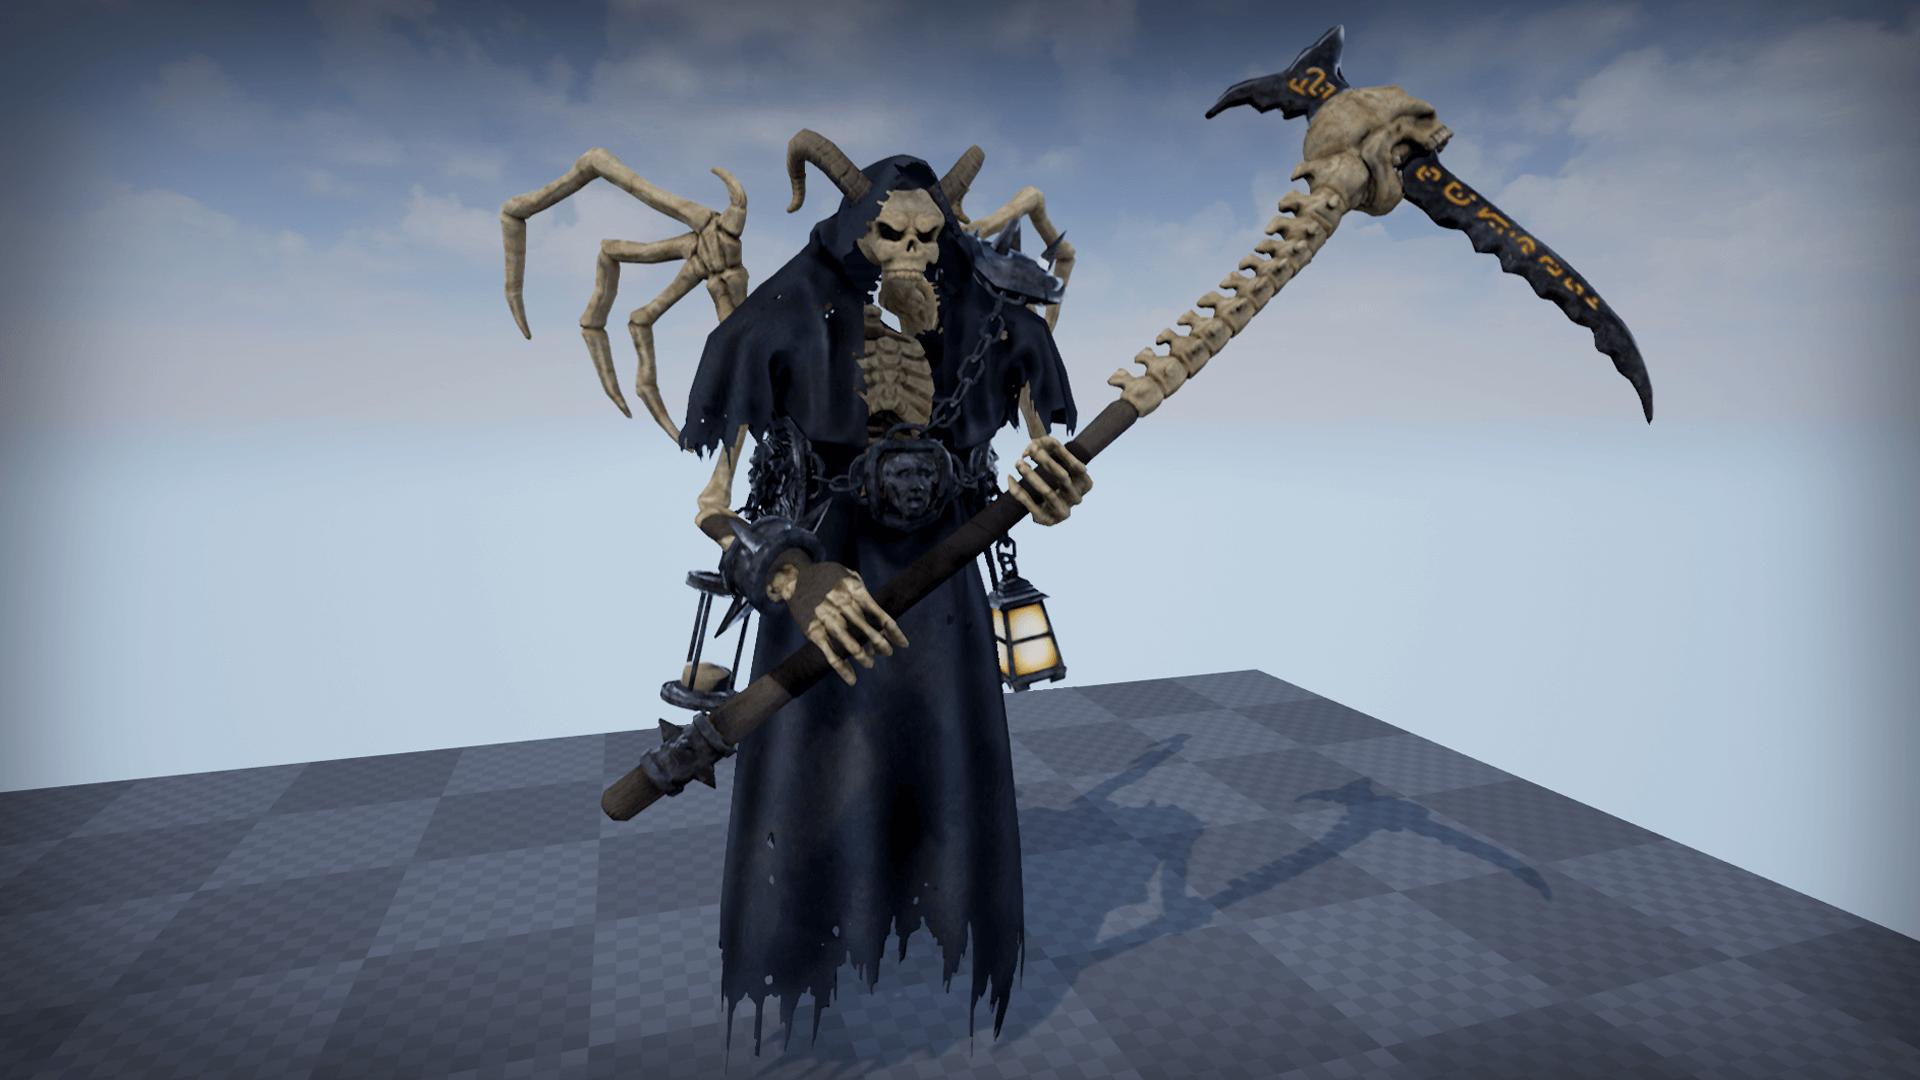 [Resim: Store_Reaper_screenshot_02-1920x1080-1e5...06ec63.png]